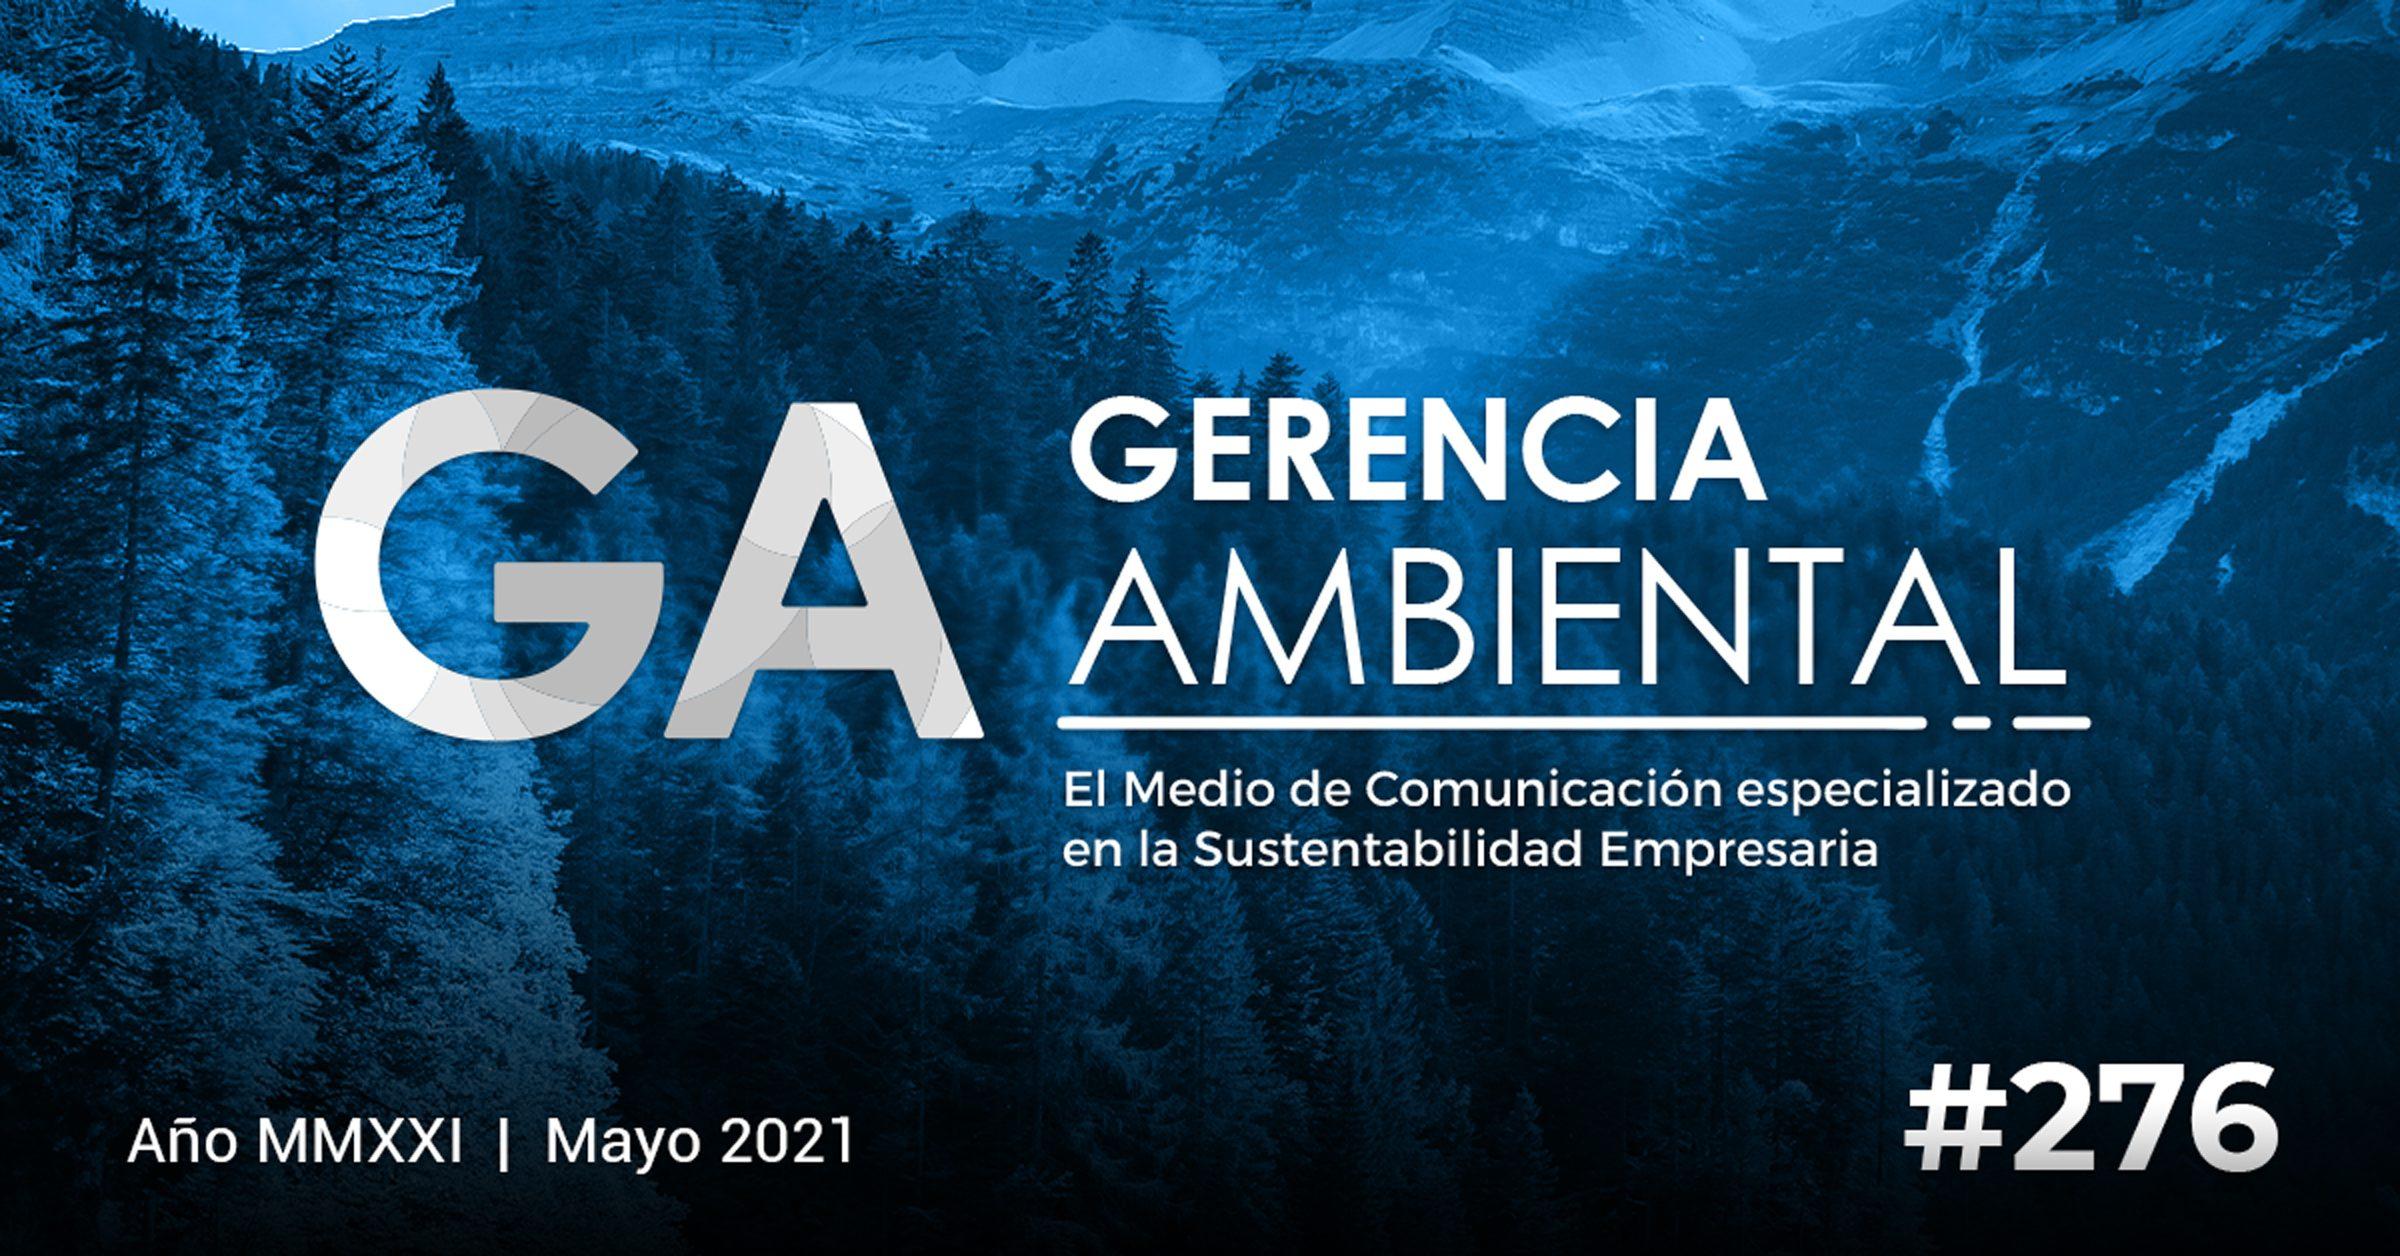 gerencia-ambiental-276